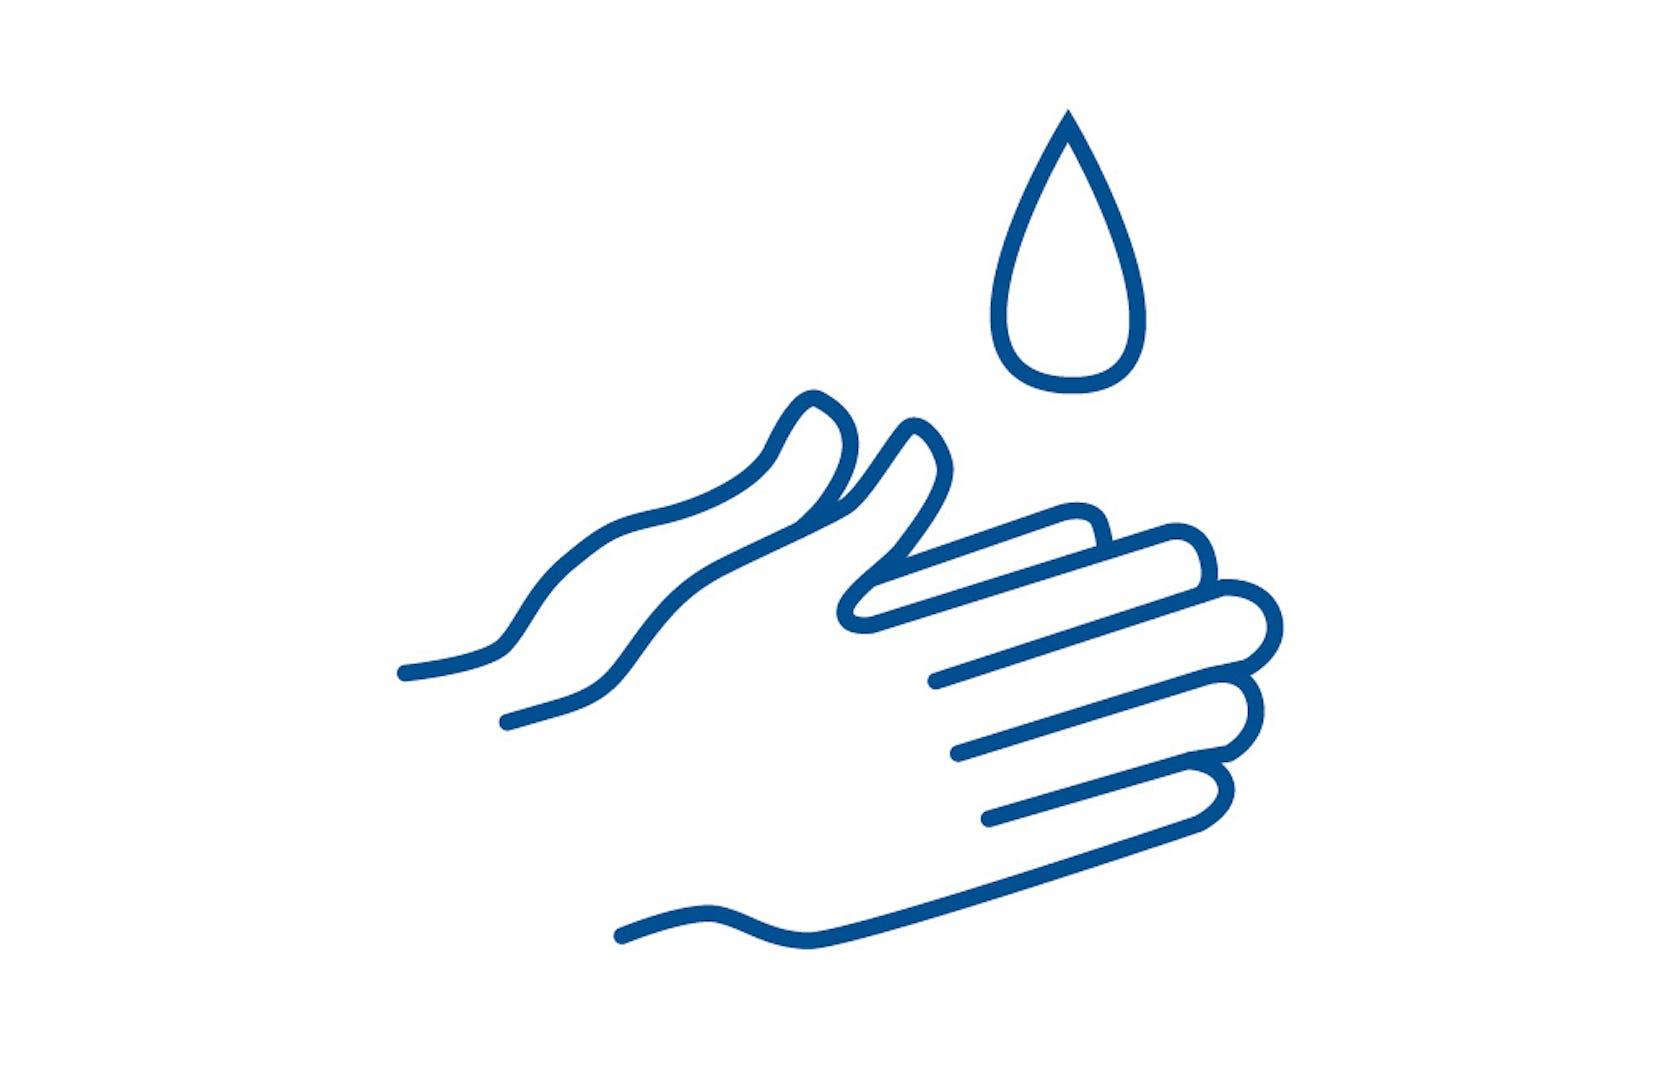 Disinfettati le mani